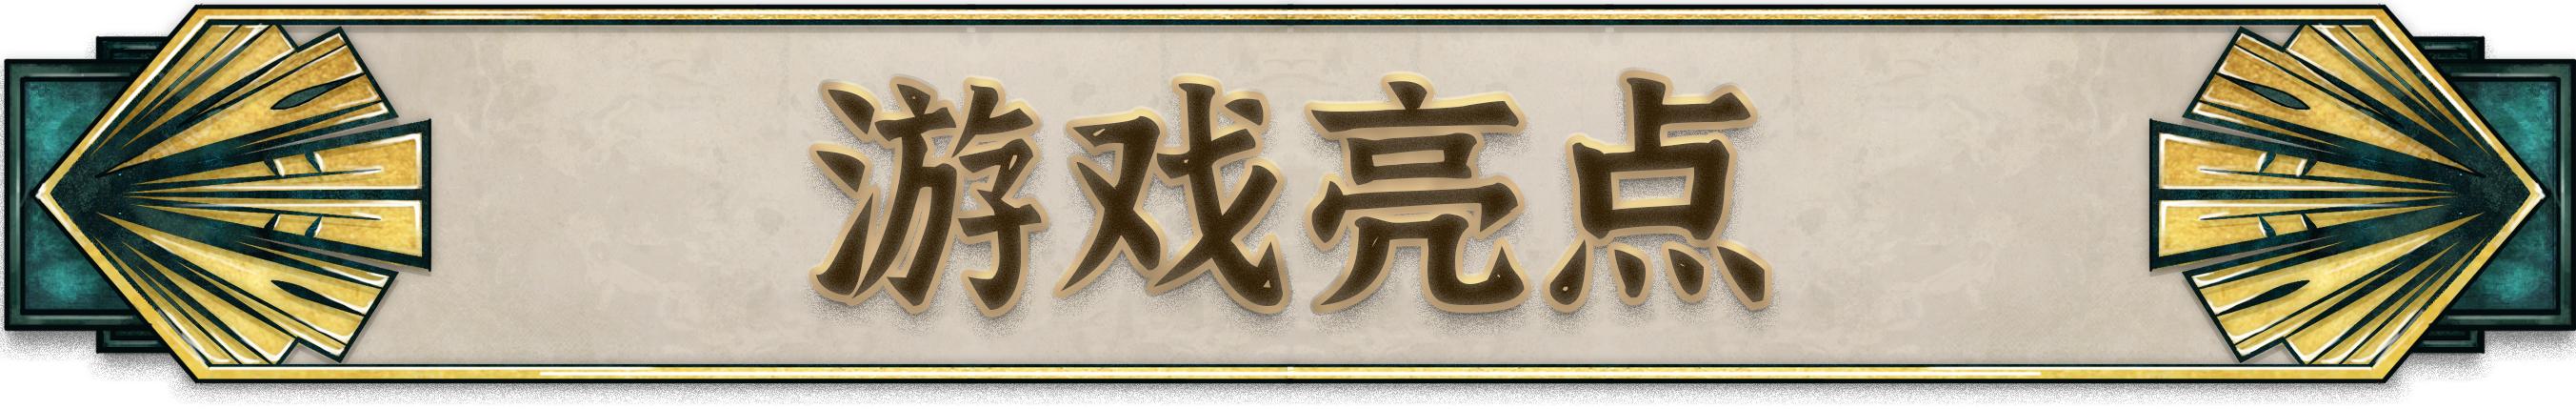 titre-ks-游戏亮点.jpg